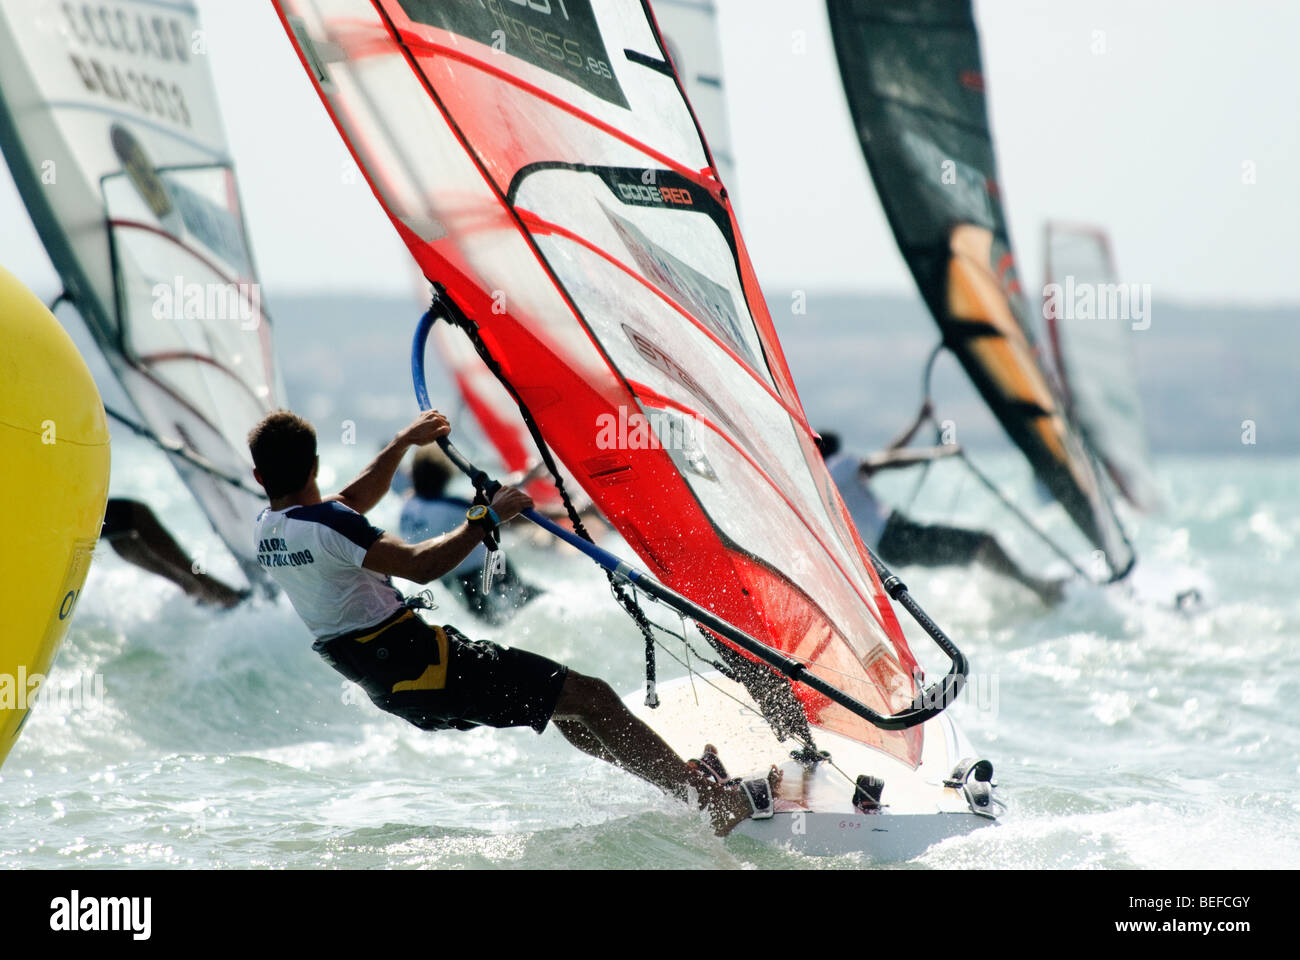 Group Of Windsurfer In Backlight At The Formula Windsurfing World Stock Photo Alamy